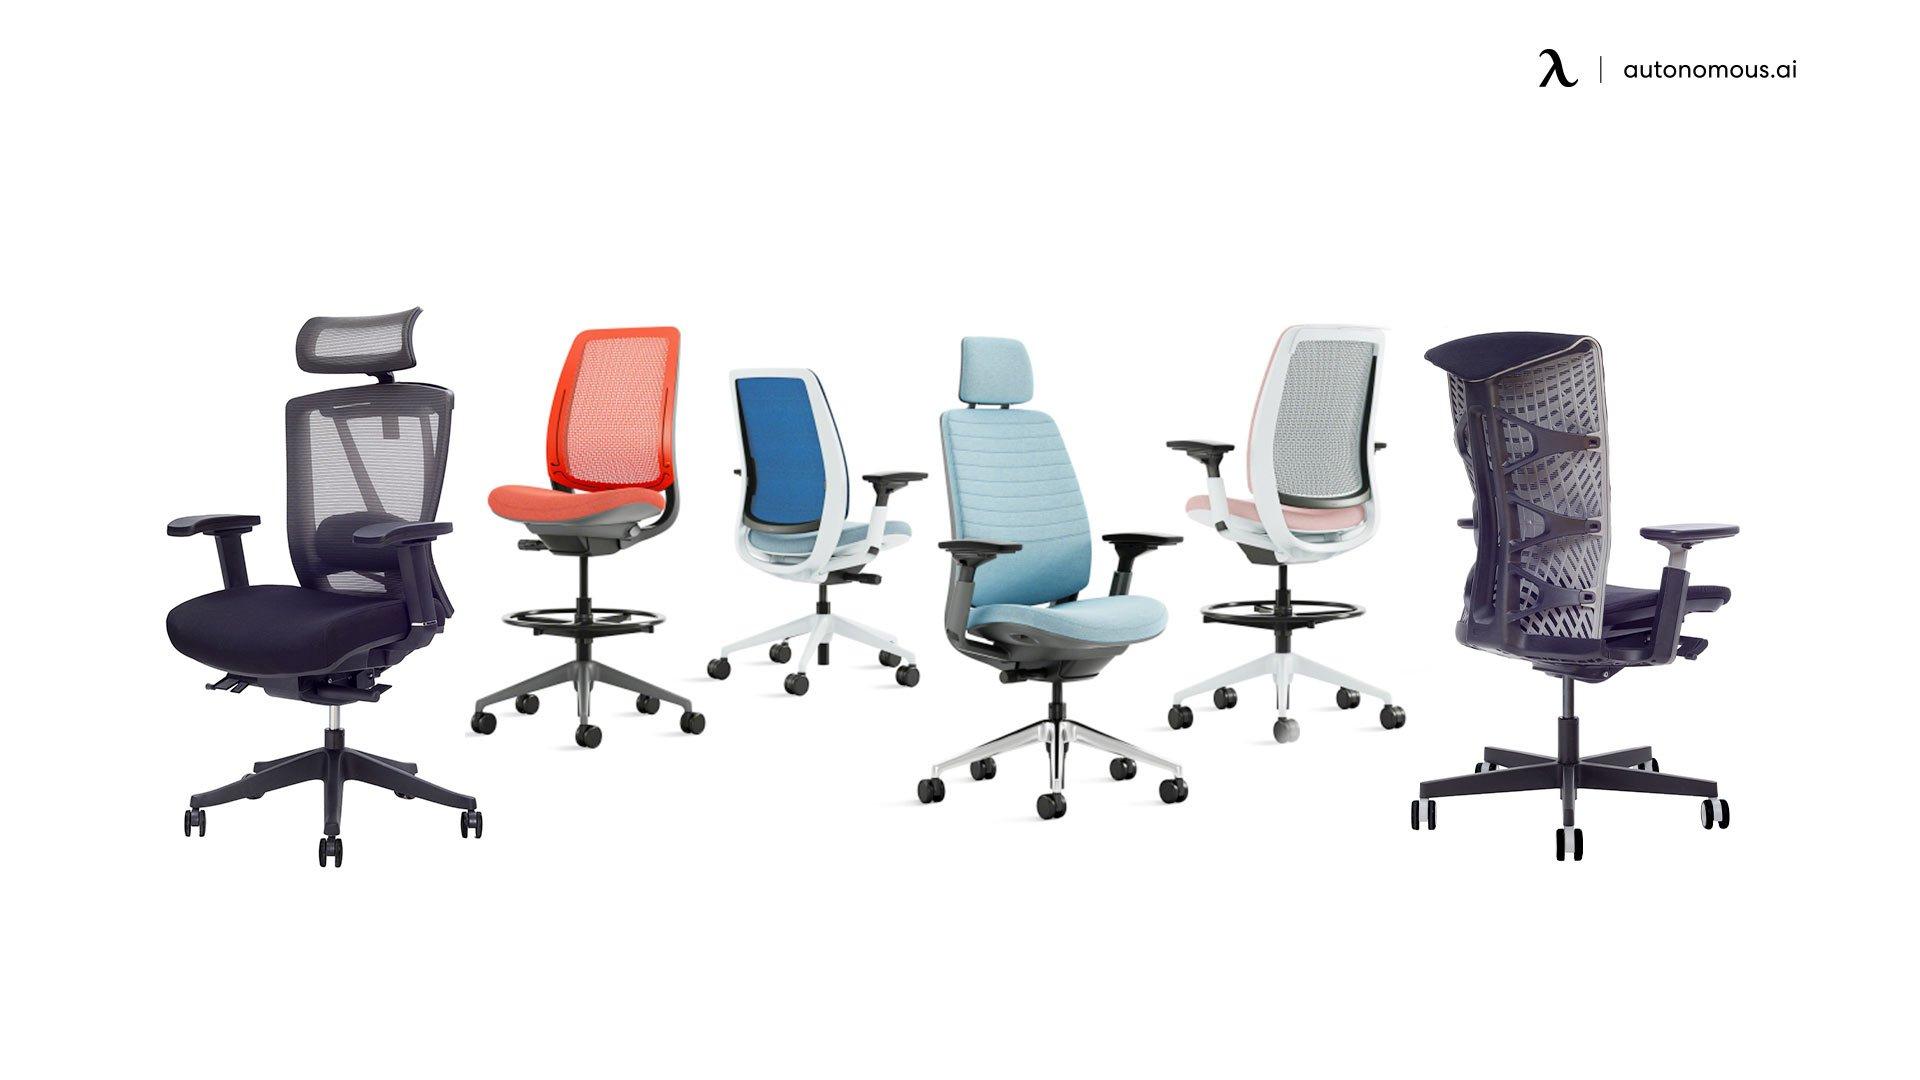 Select an Ergonomic Chair